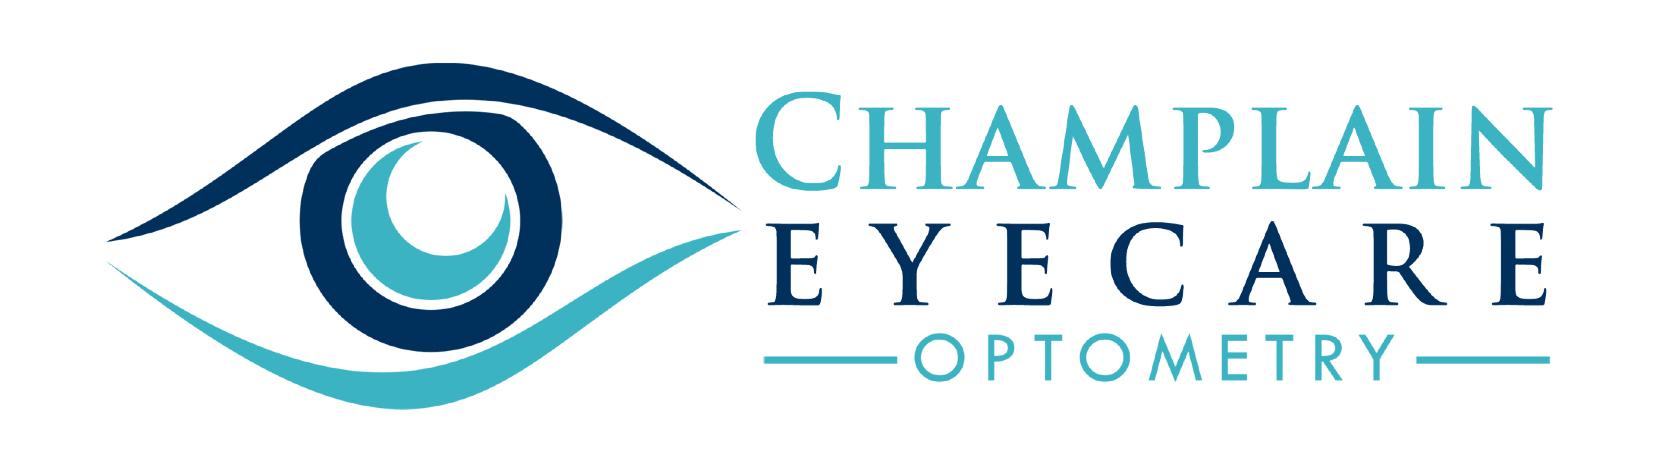 Champlain Eyecare